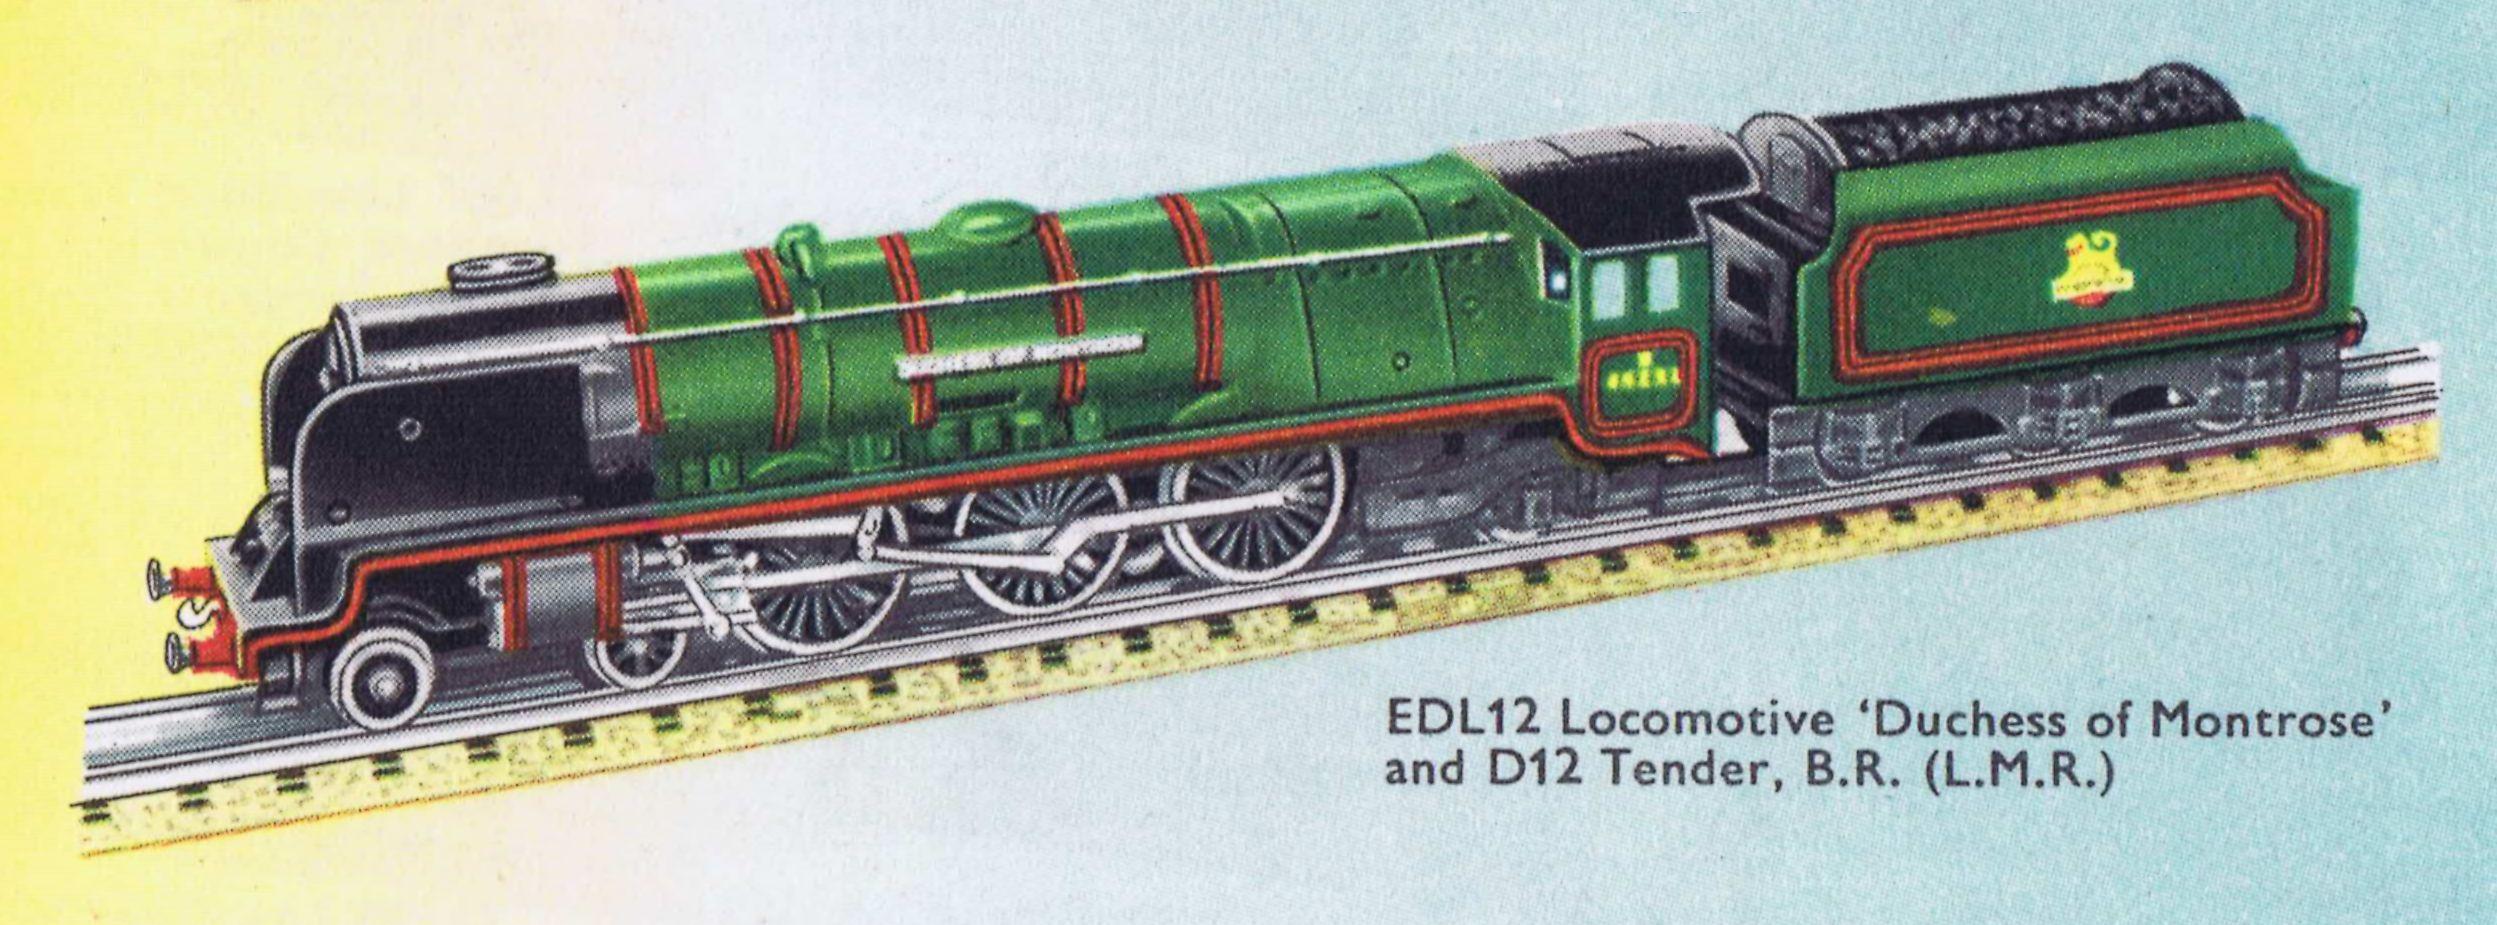 Hornby train set duchess of montrose locomotive